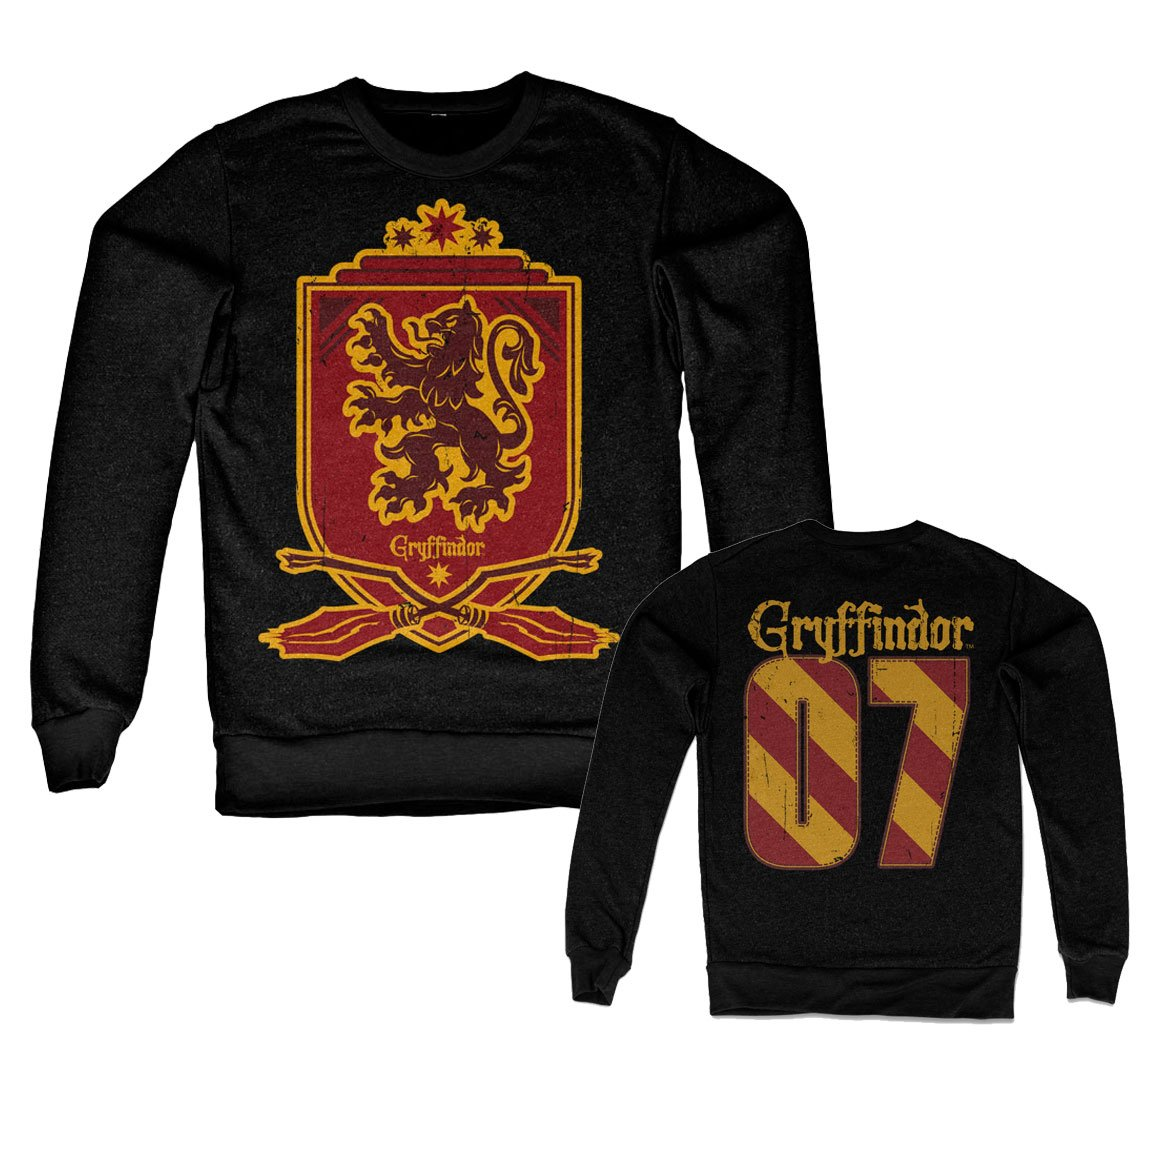 Nera HARRY POTTER Licenza Ufficiale Inked Gryffindor 07 Felpa